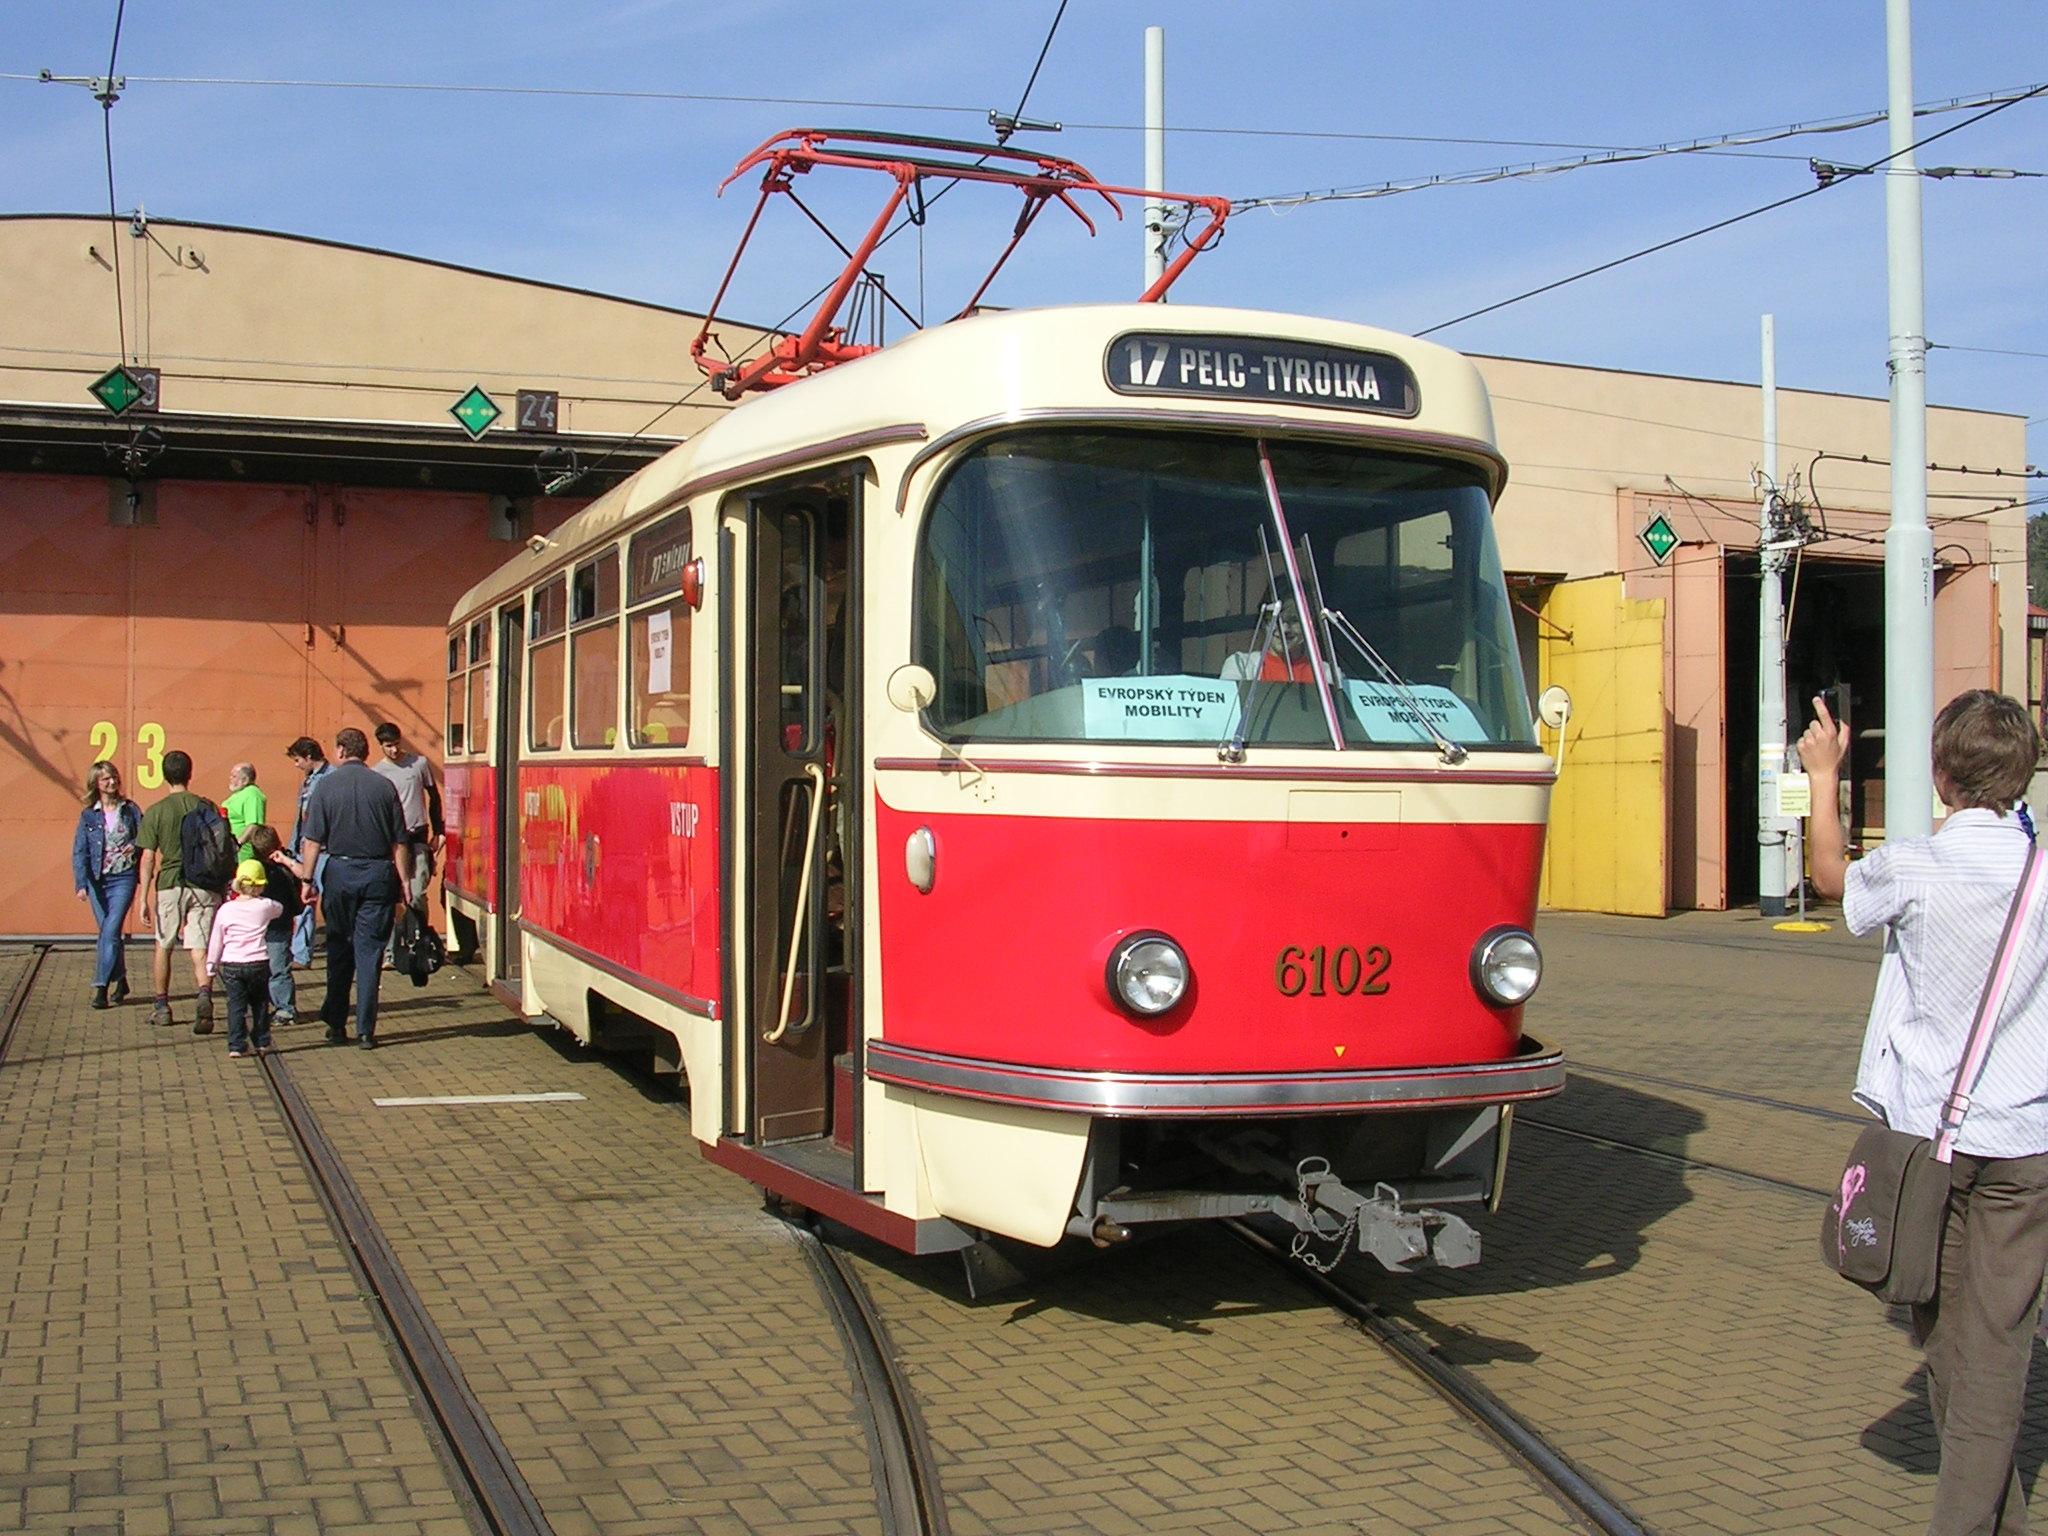 El juego de las imagenes-http://upload.wikimedia.org/wikipedia/commons/b/b3/Tram_Tatra_T3_Praha_6102.jpg